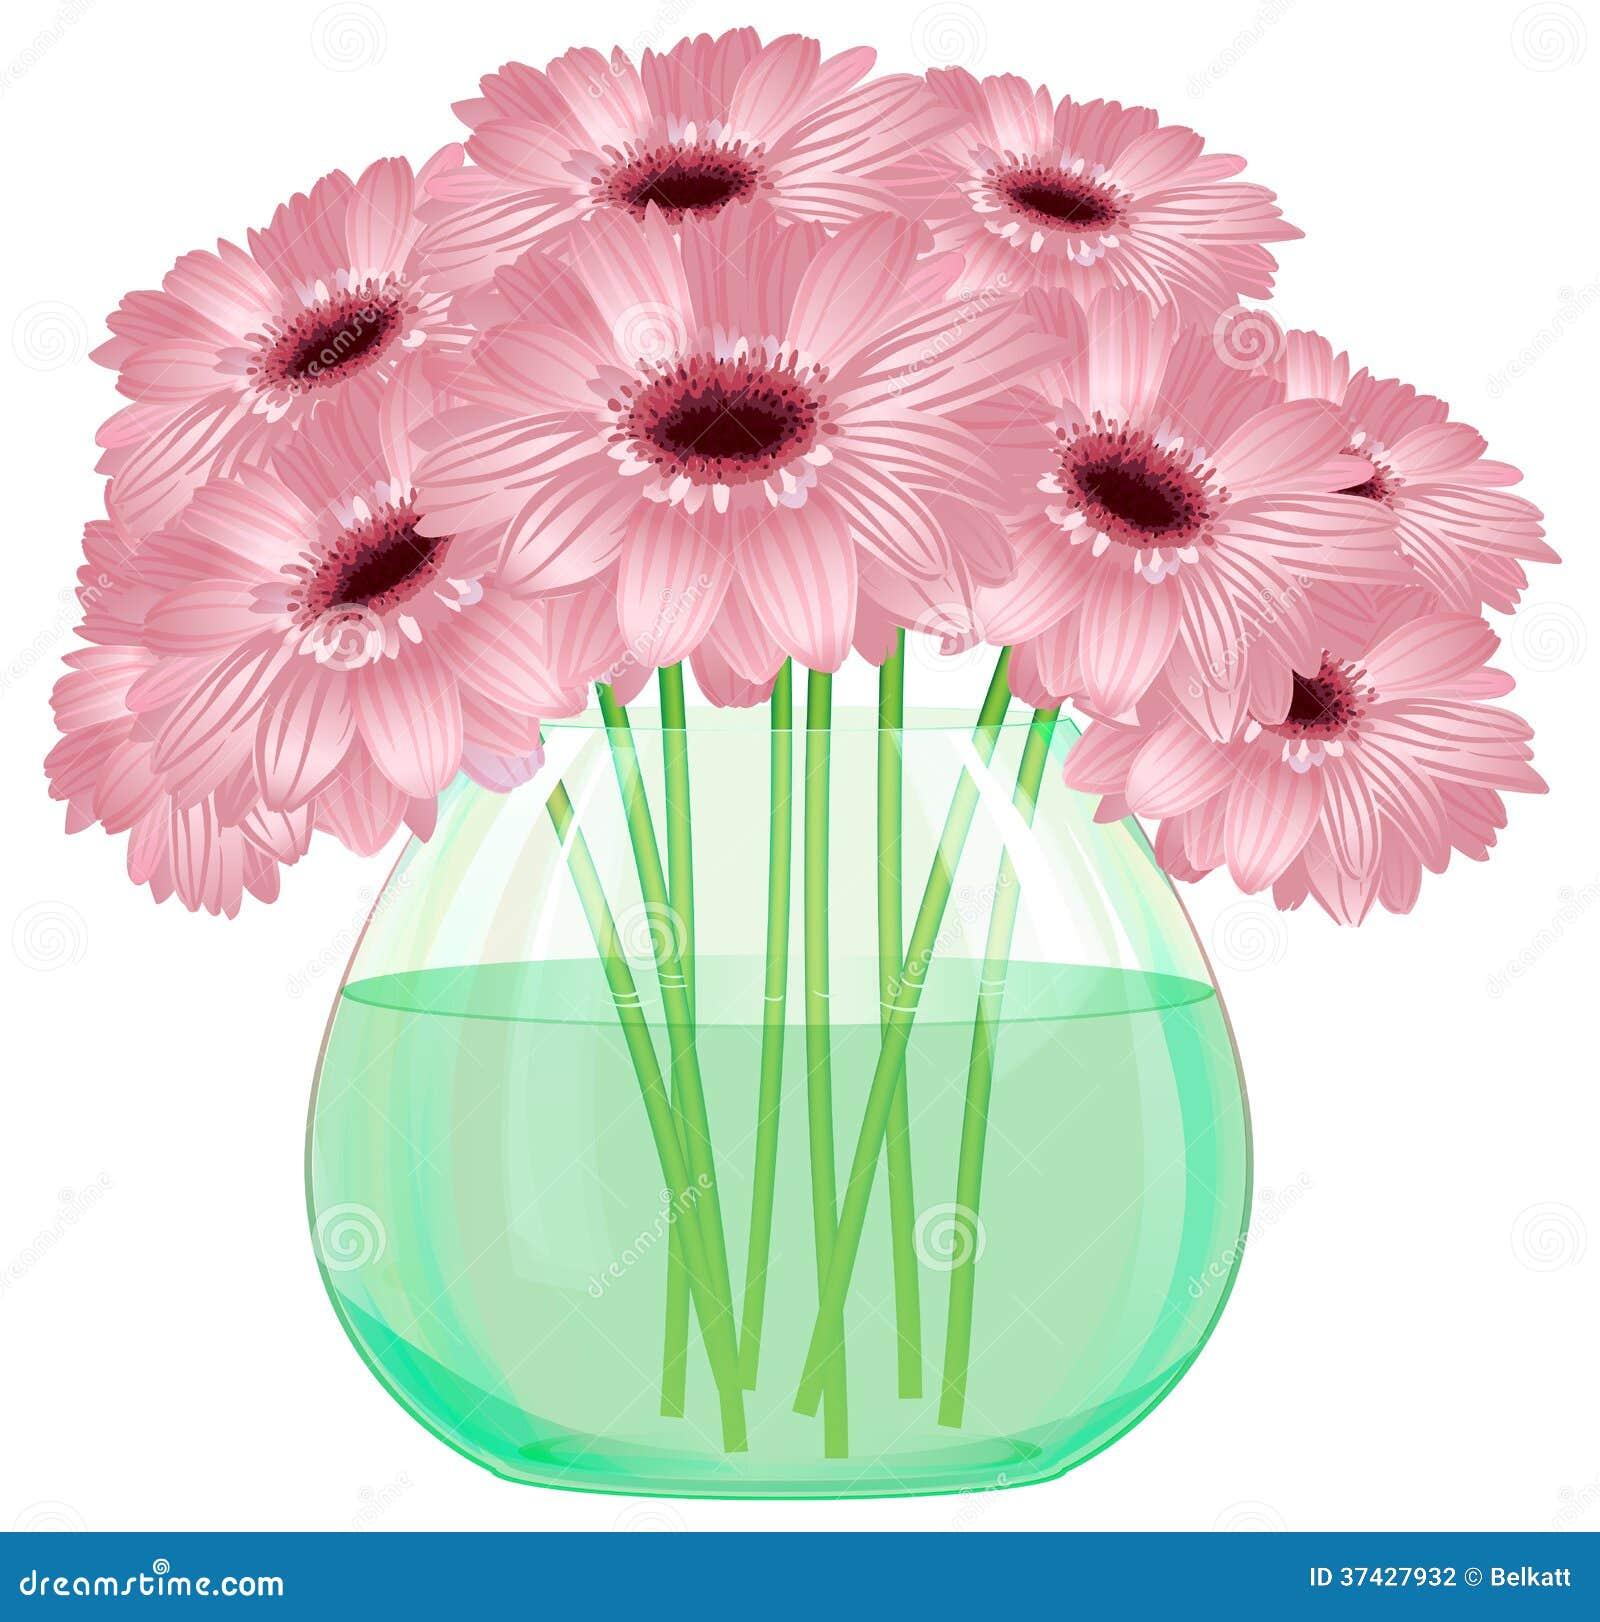 Daisy Gerbera Flower Bouquet In Glass Vase Stock Vector